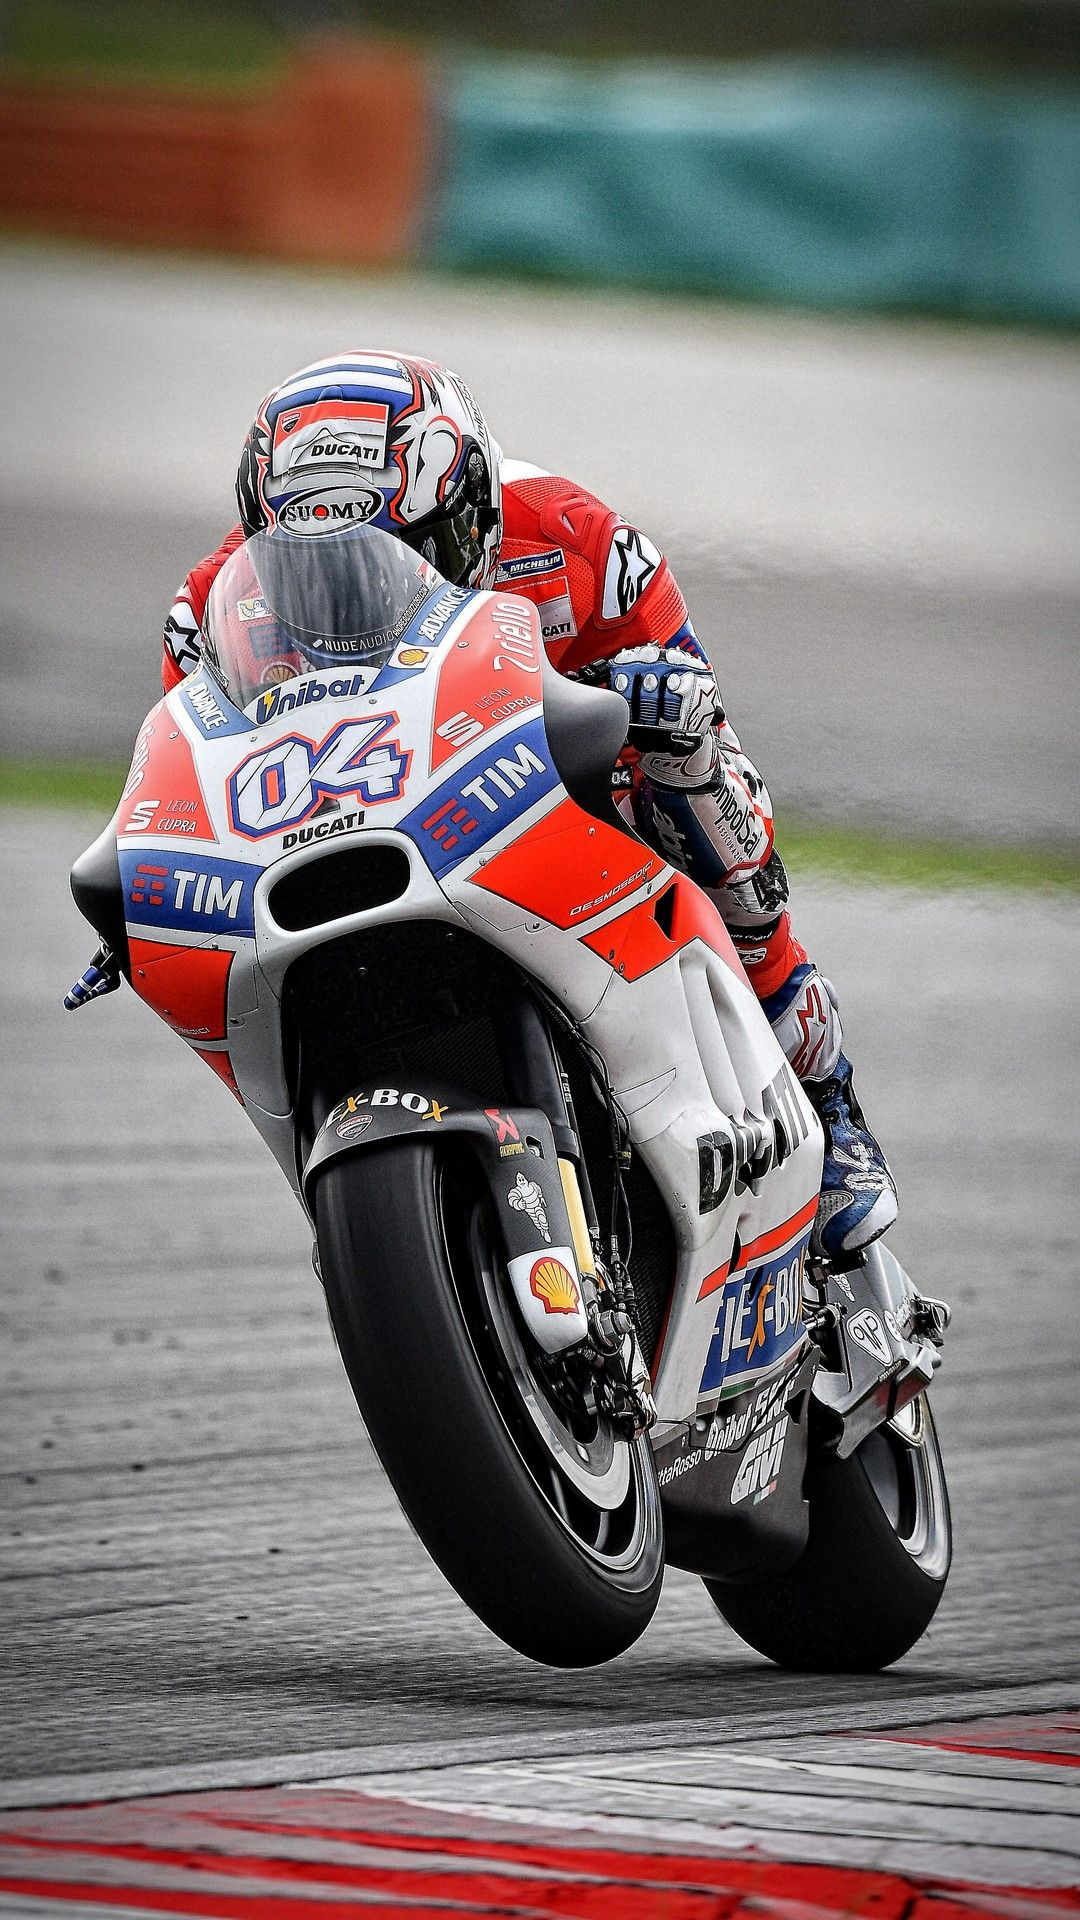 Andrea Dovizioso Ducati iPhone Wallpaper Motogp Ducati Racing 1080x1920